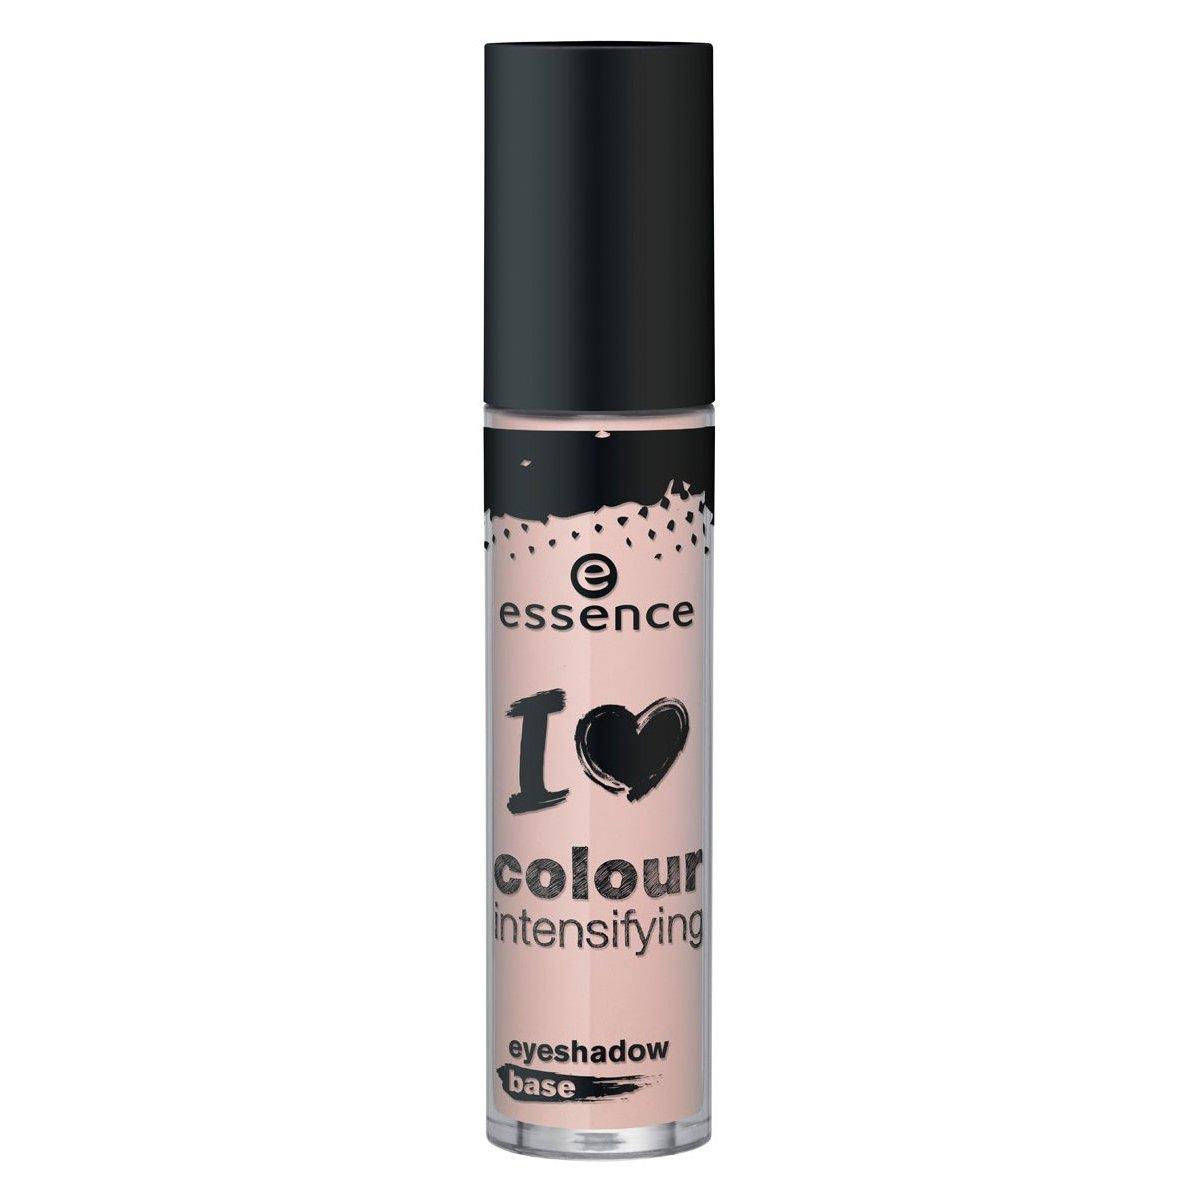 Essence I Love Colour Intensifying Eyeshadow Base - Full Size